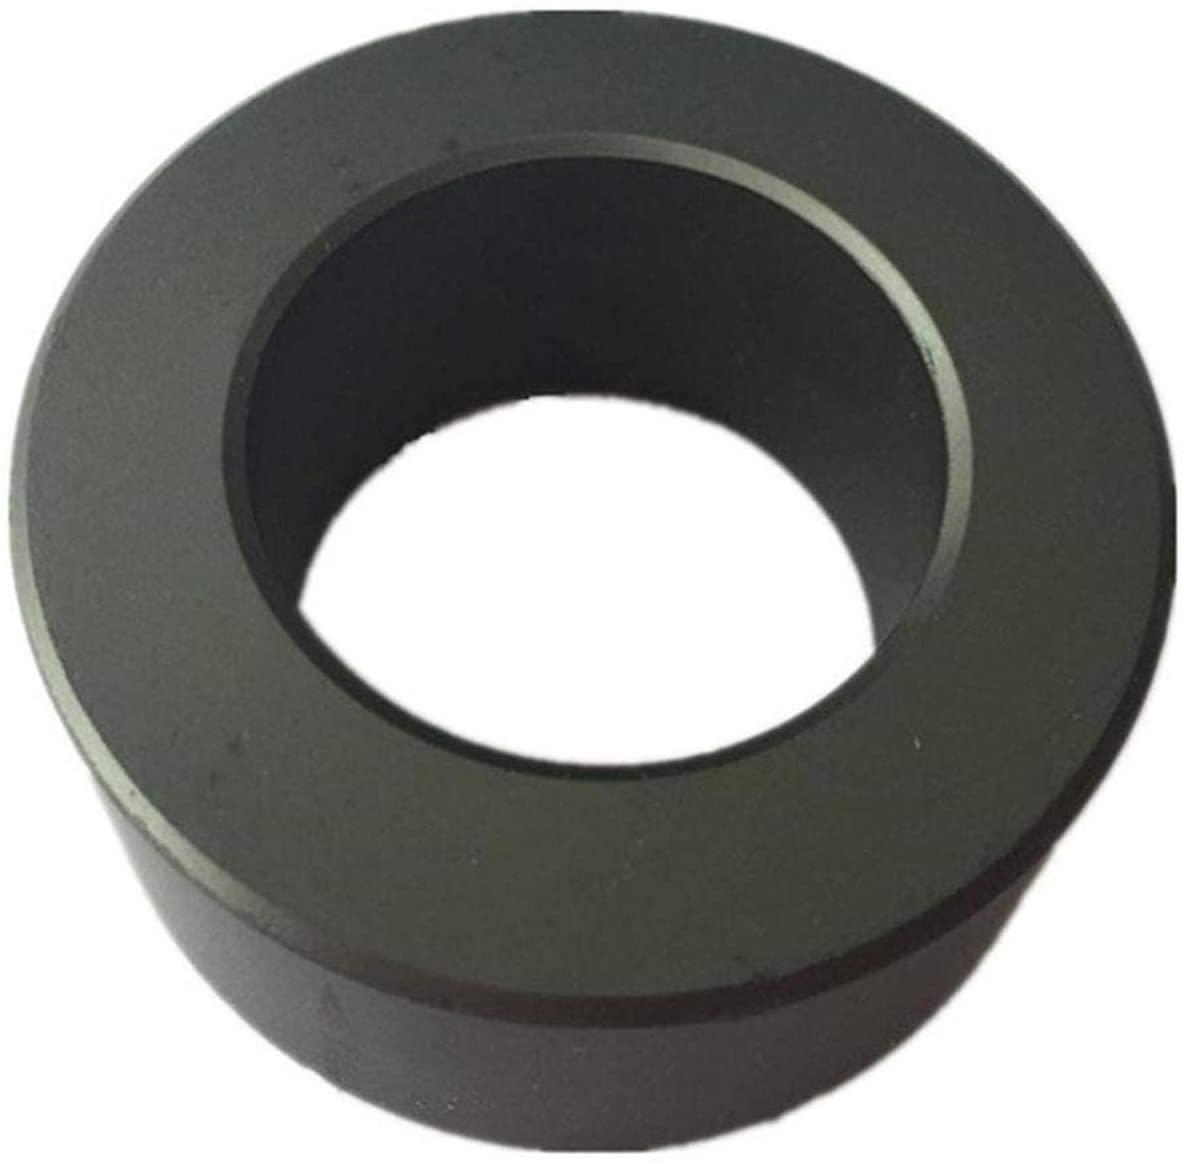 1ea 63X38X25mm ferrite core for Transformer Chokes Isolator or Filter ferrite Bead for Cable Cord MnZn PC40